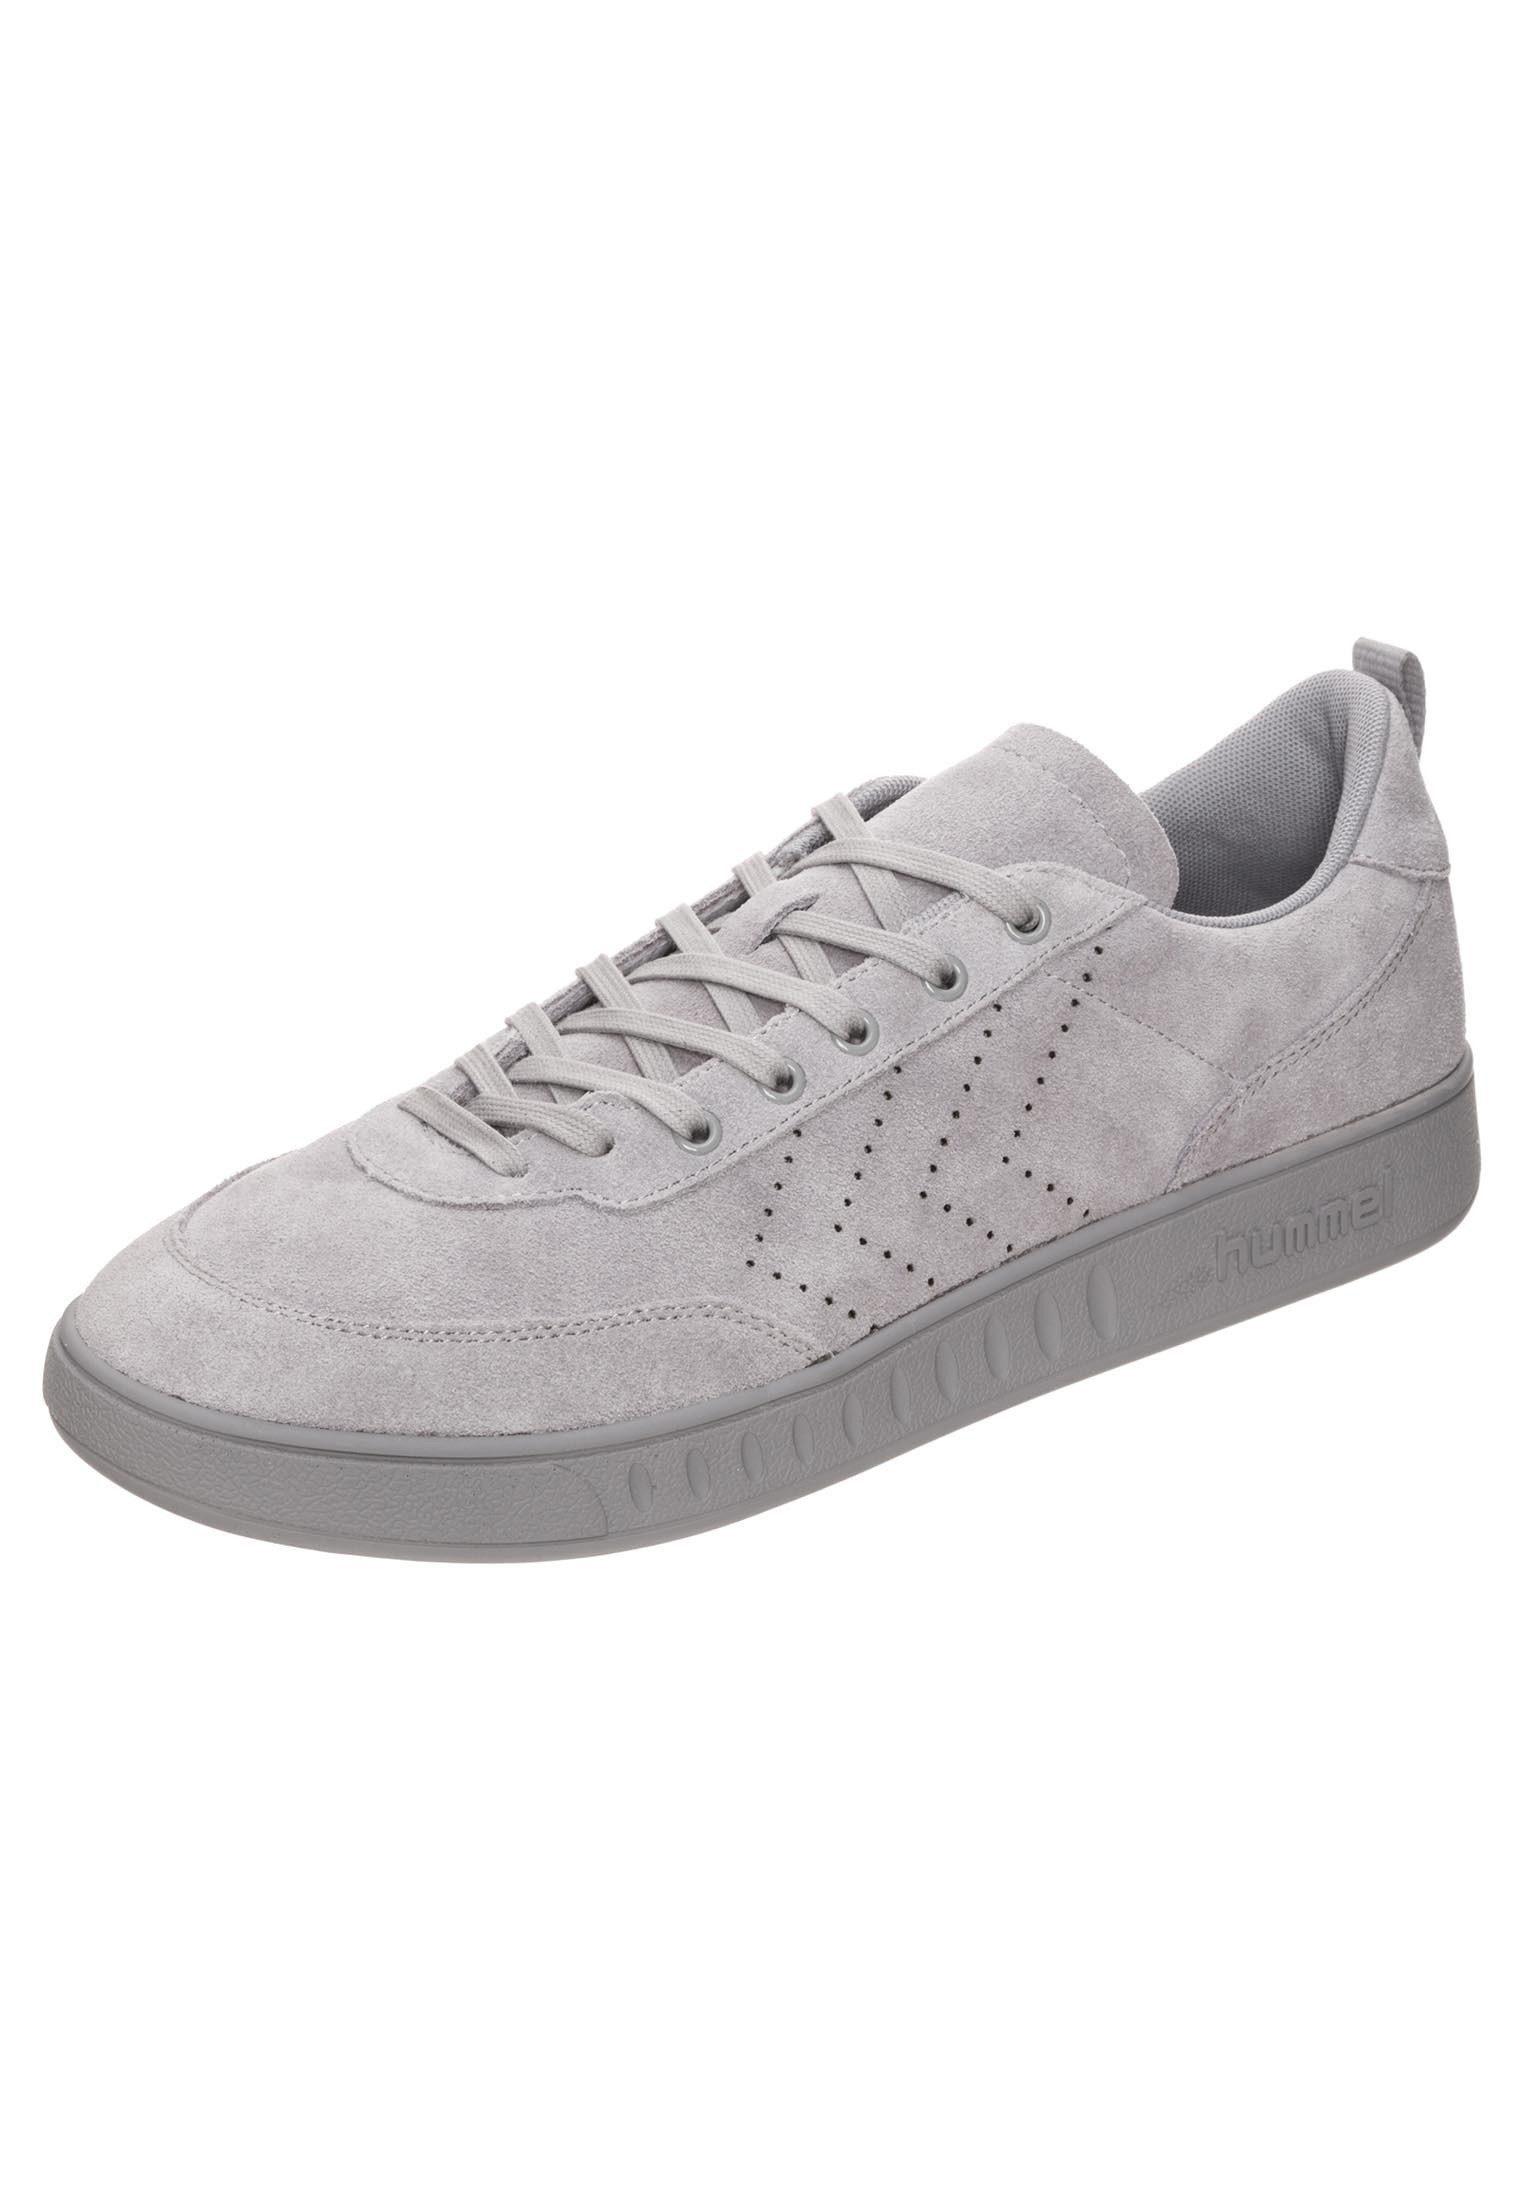 Hummel Super Trimm Casual Sneaker online kaufen  grau